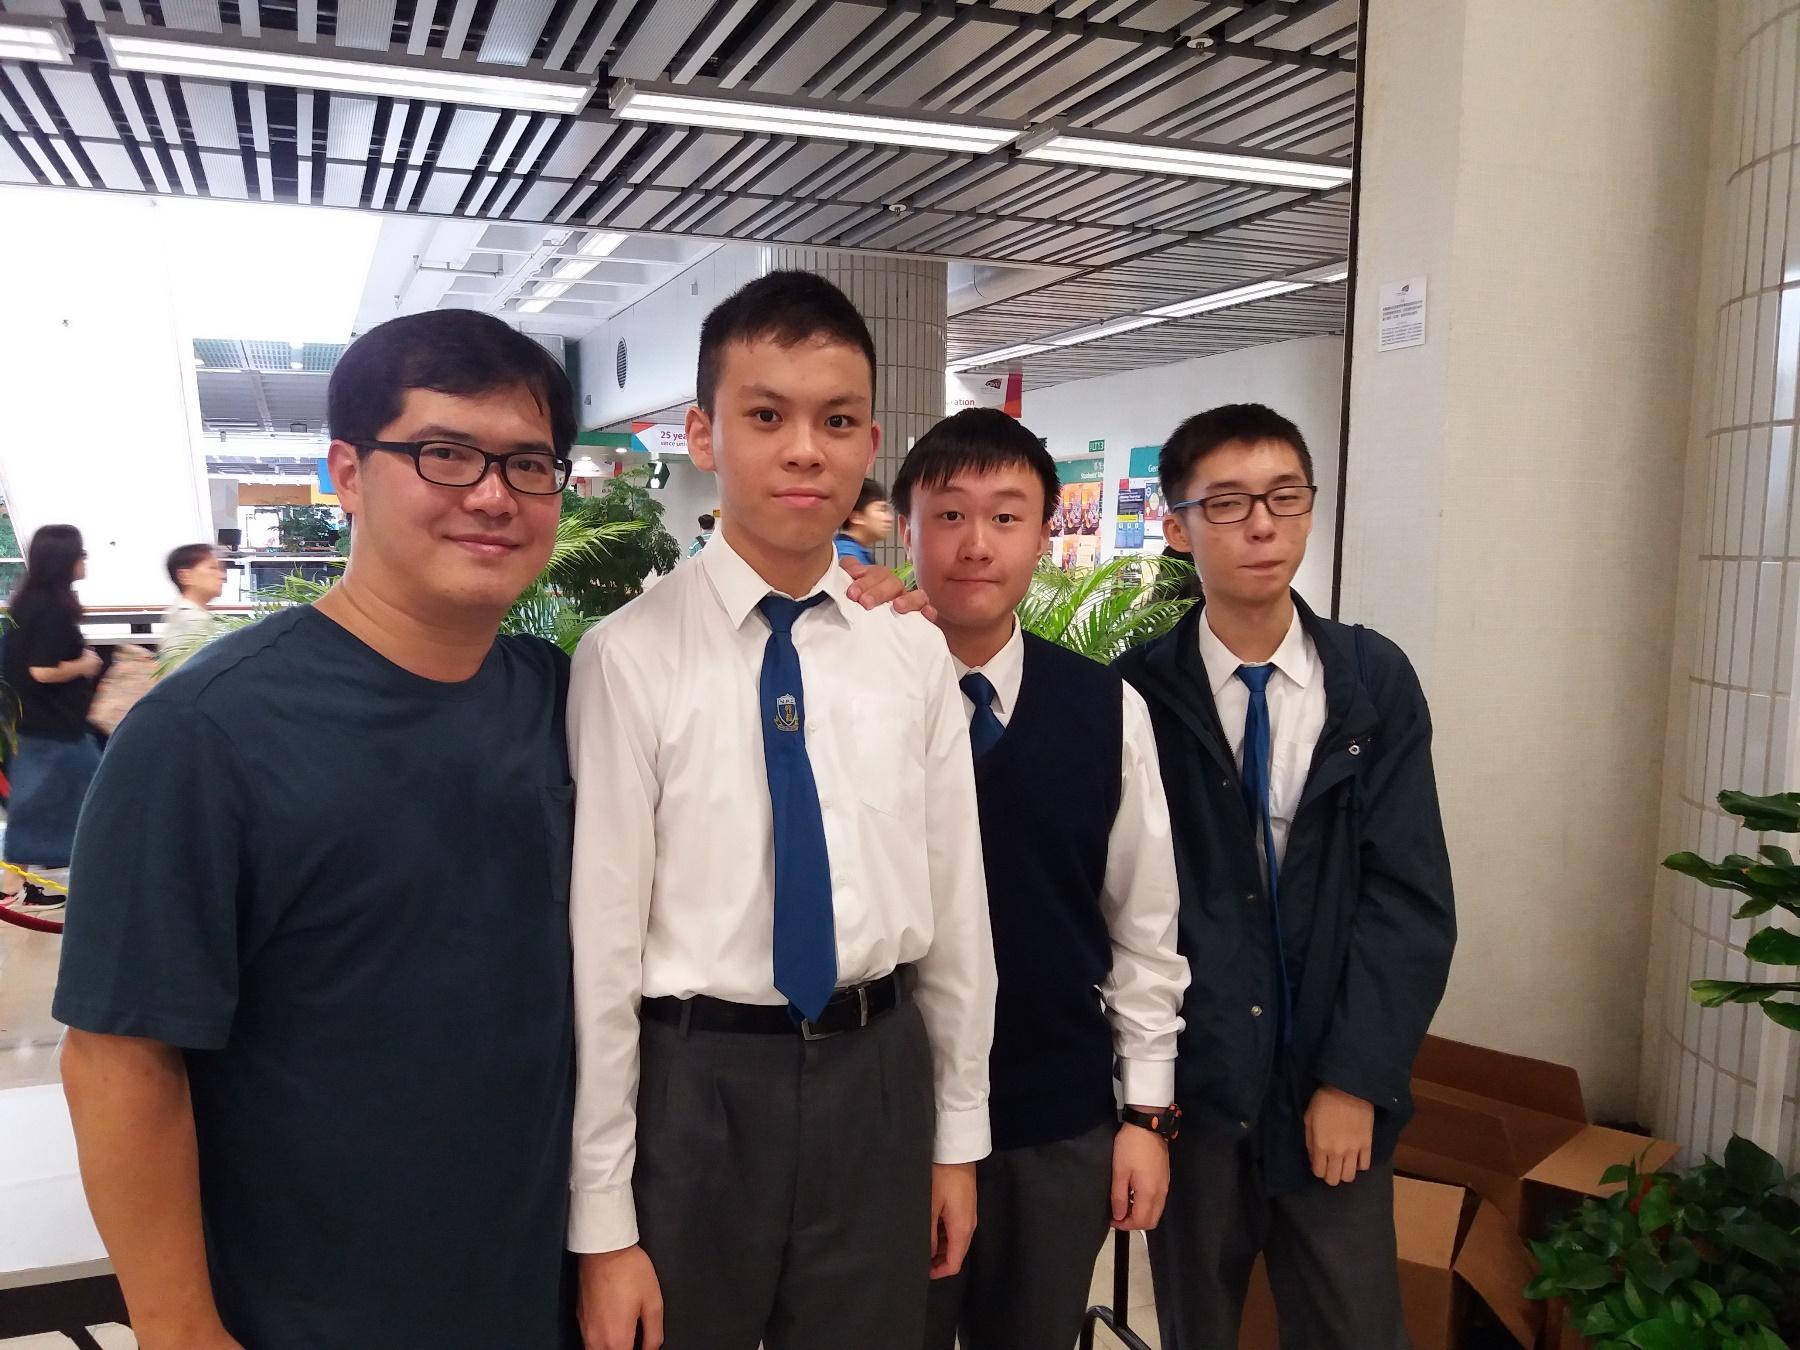 http://npc.edu.hk/sites/default/files/20190407_105253.jpg